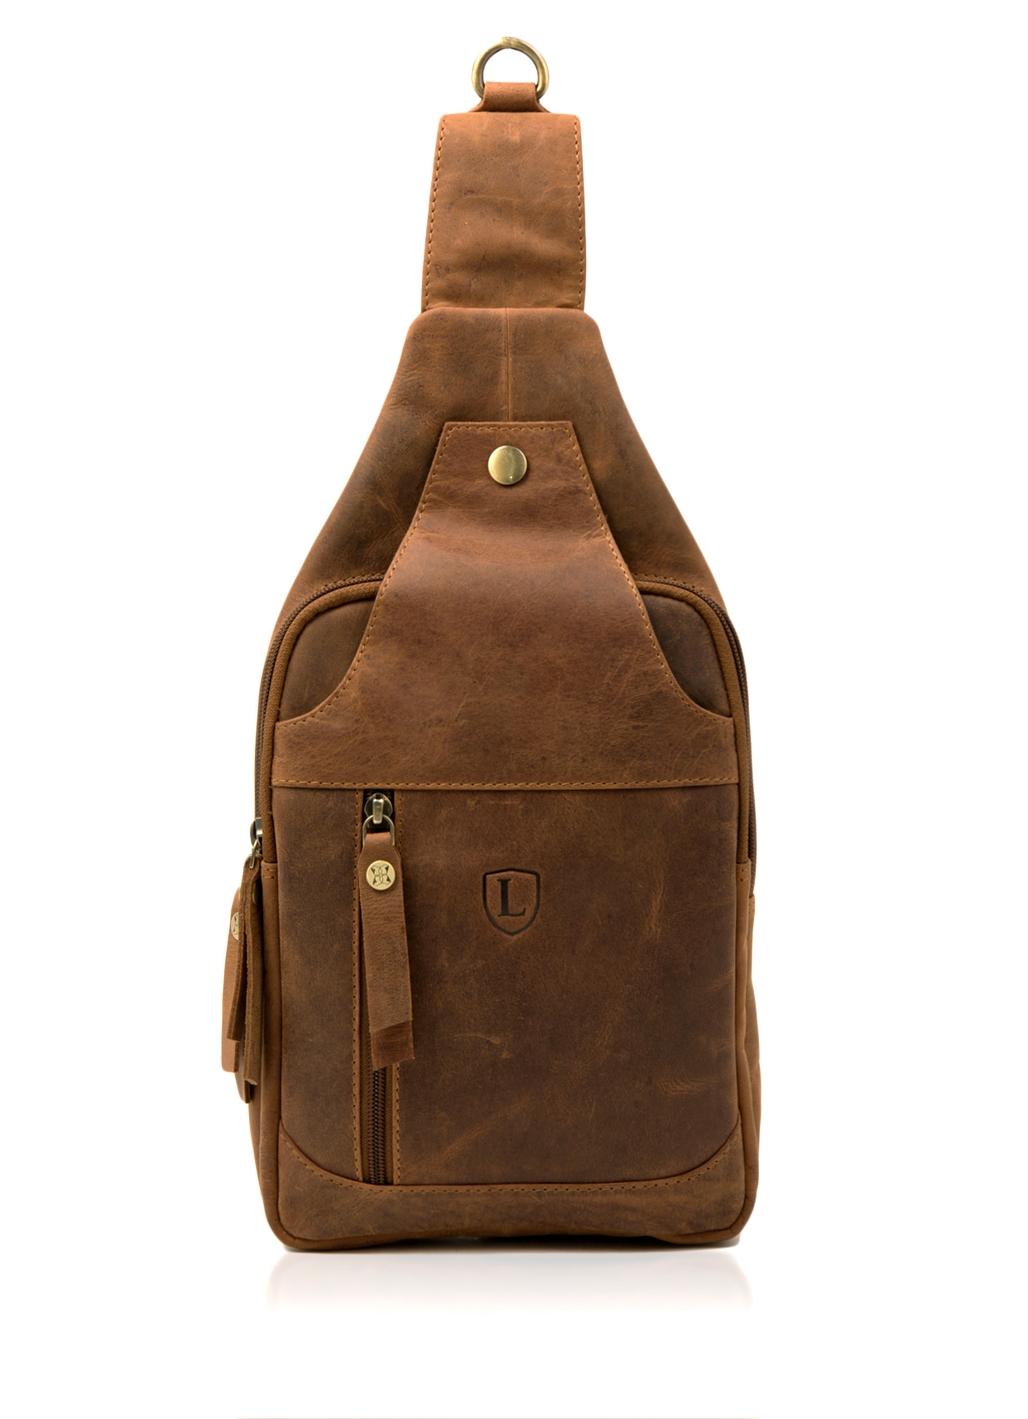 Hunter Leather Sling Bag in Tan